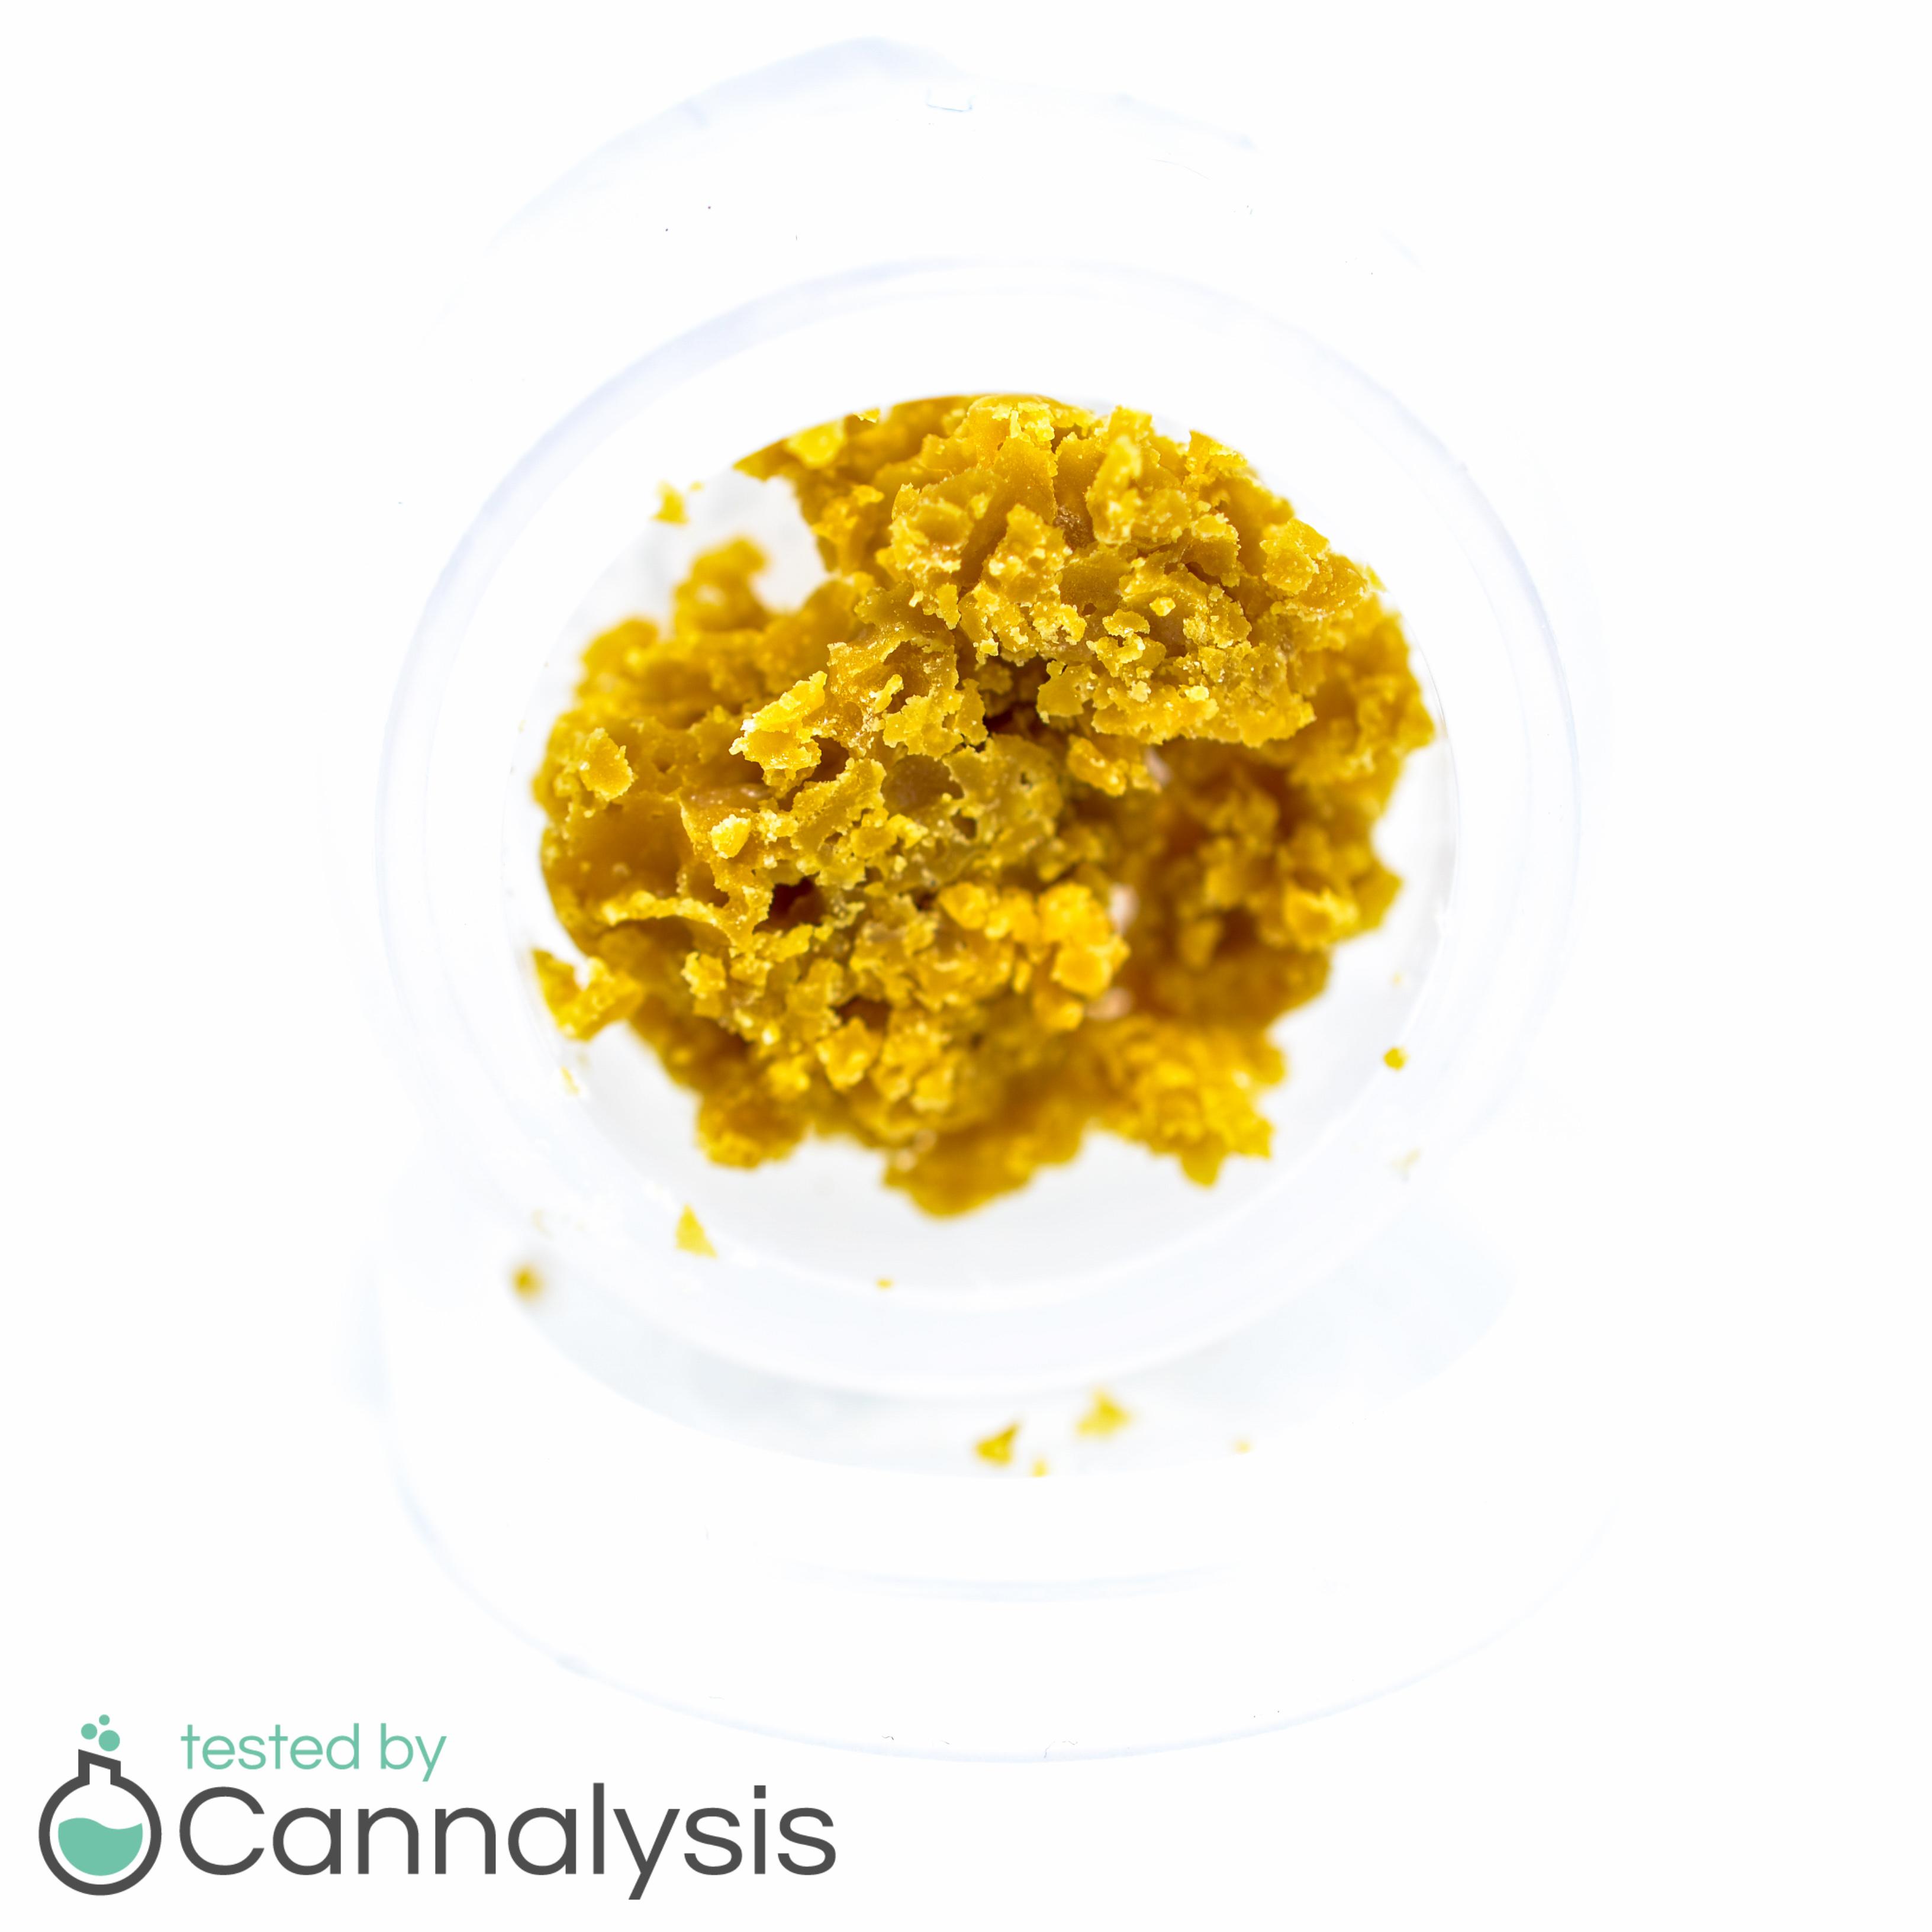 Cannabis Testing Software